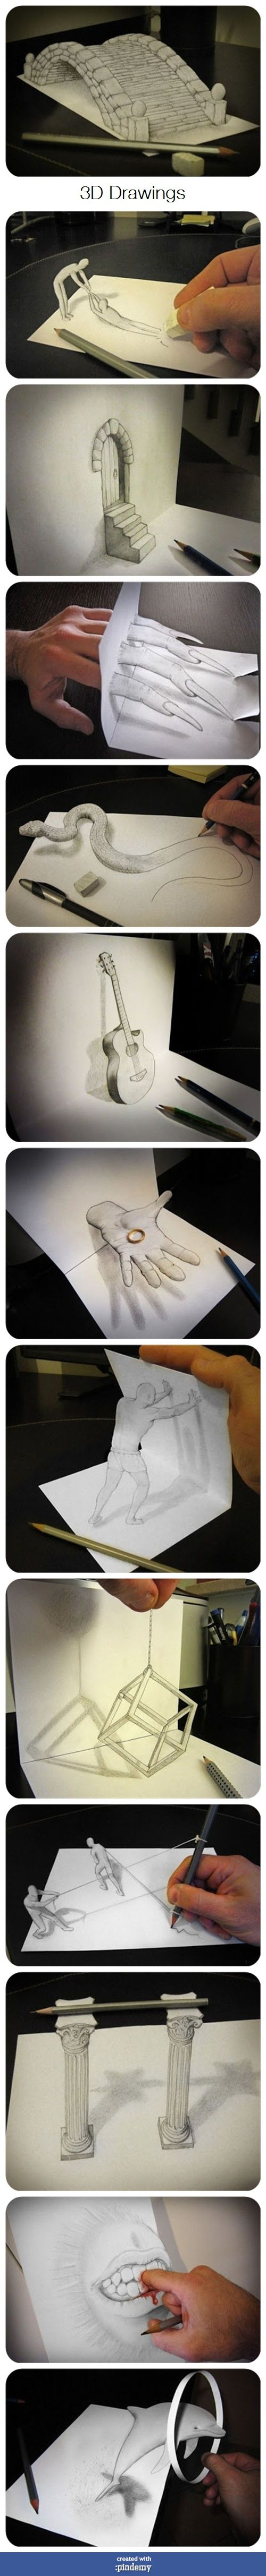 3D Drawings via pindemy.com